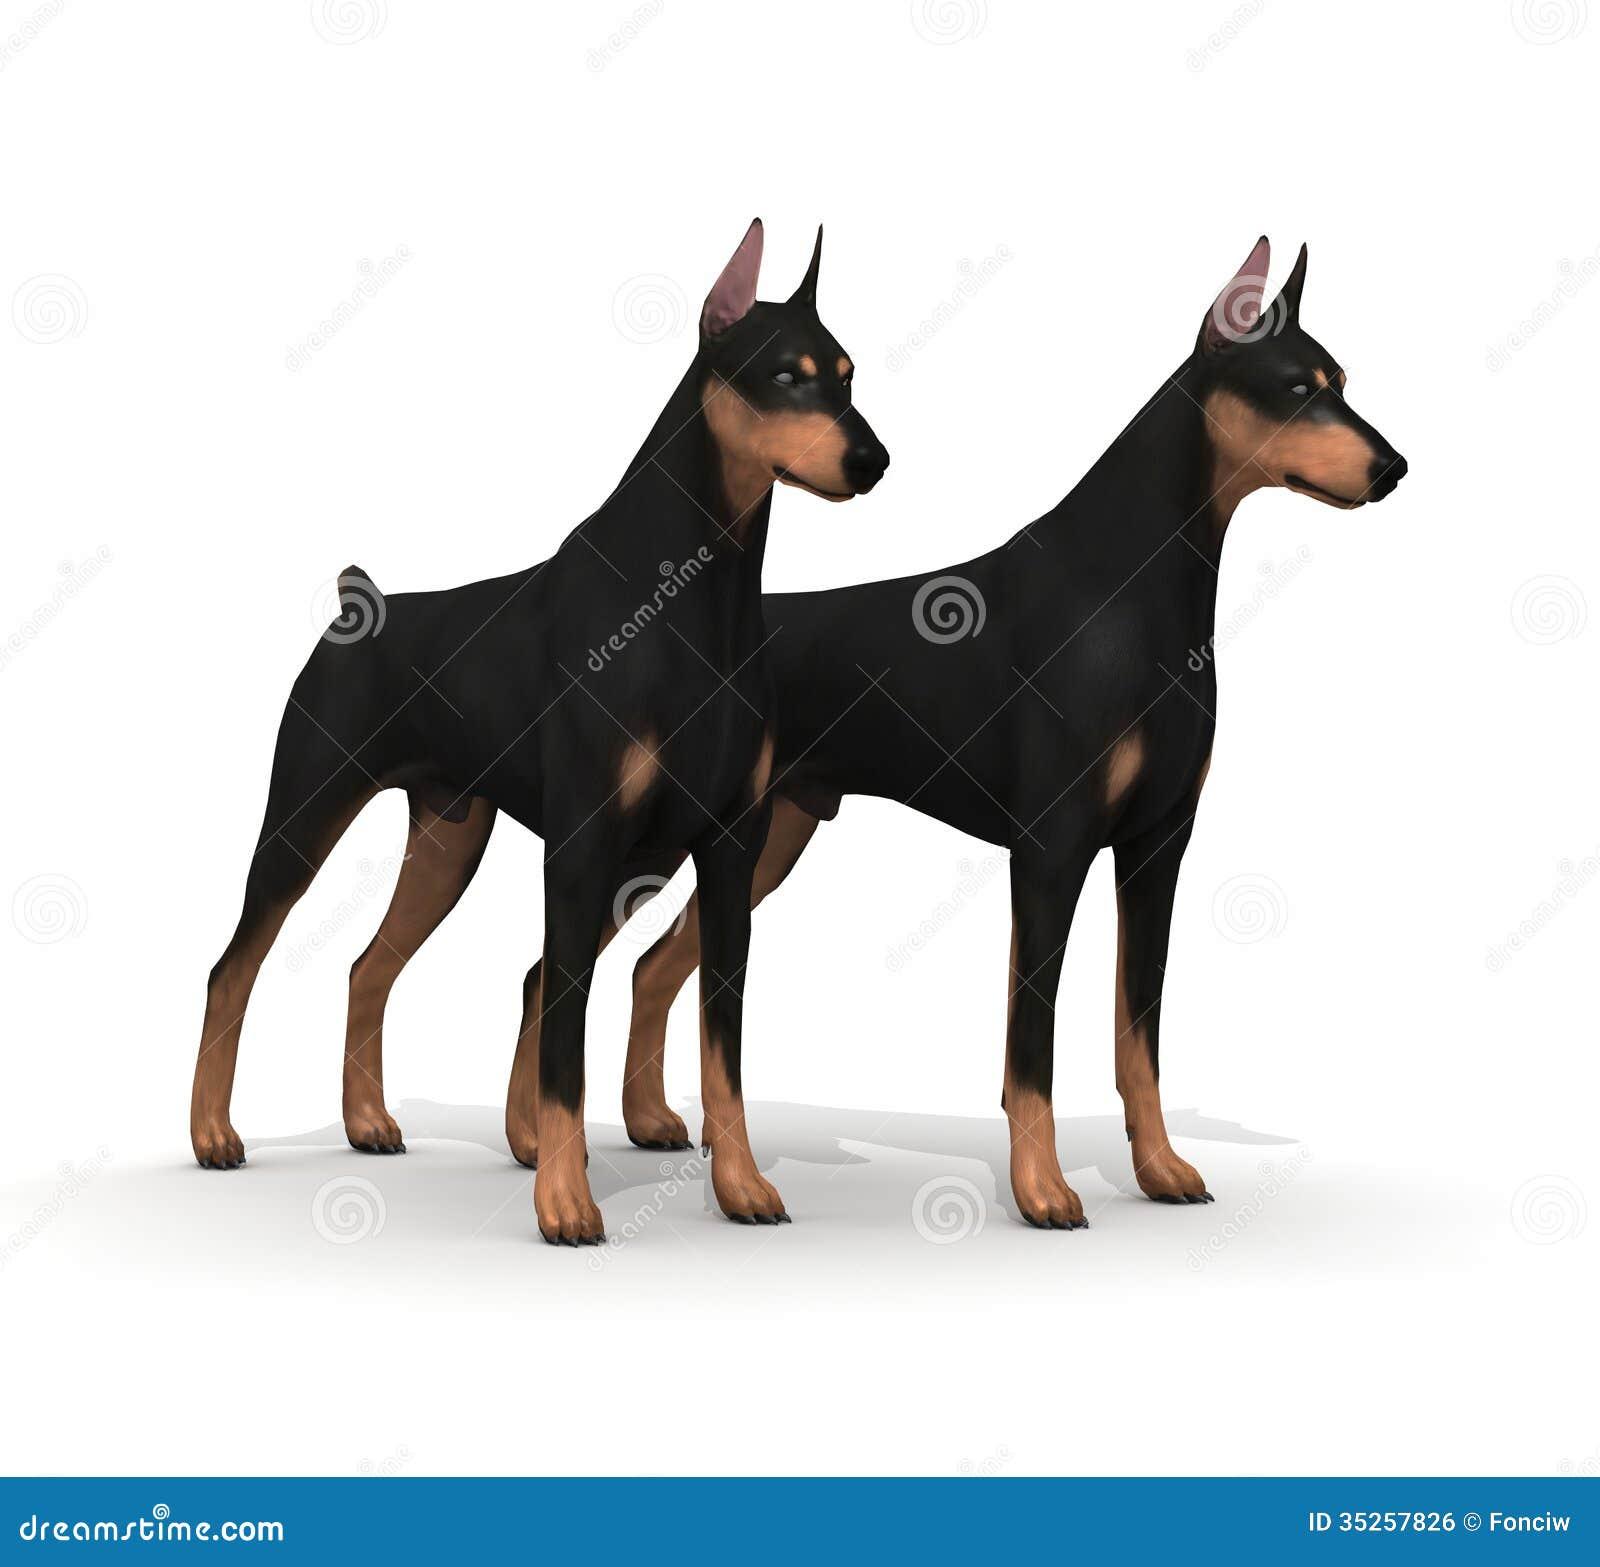 Couple Doberman Protection Royalty Free Stock Image - Image: 35257826